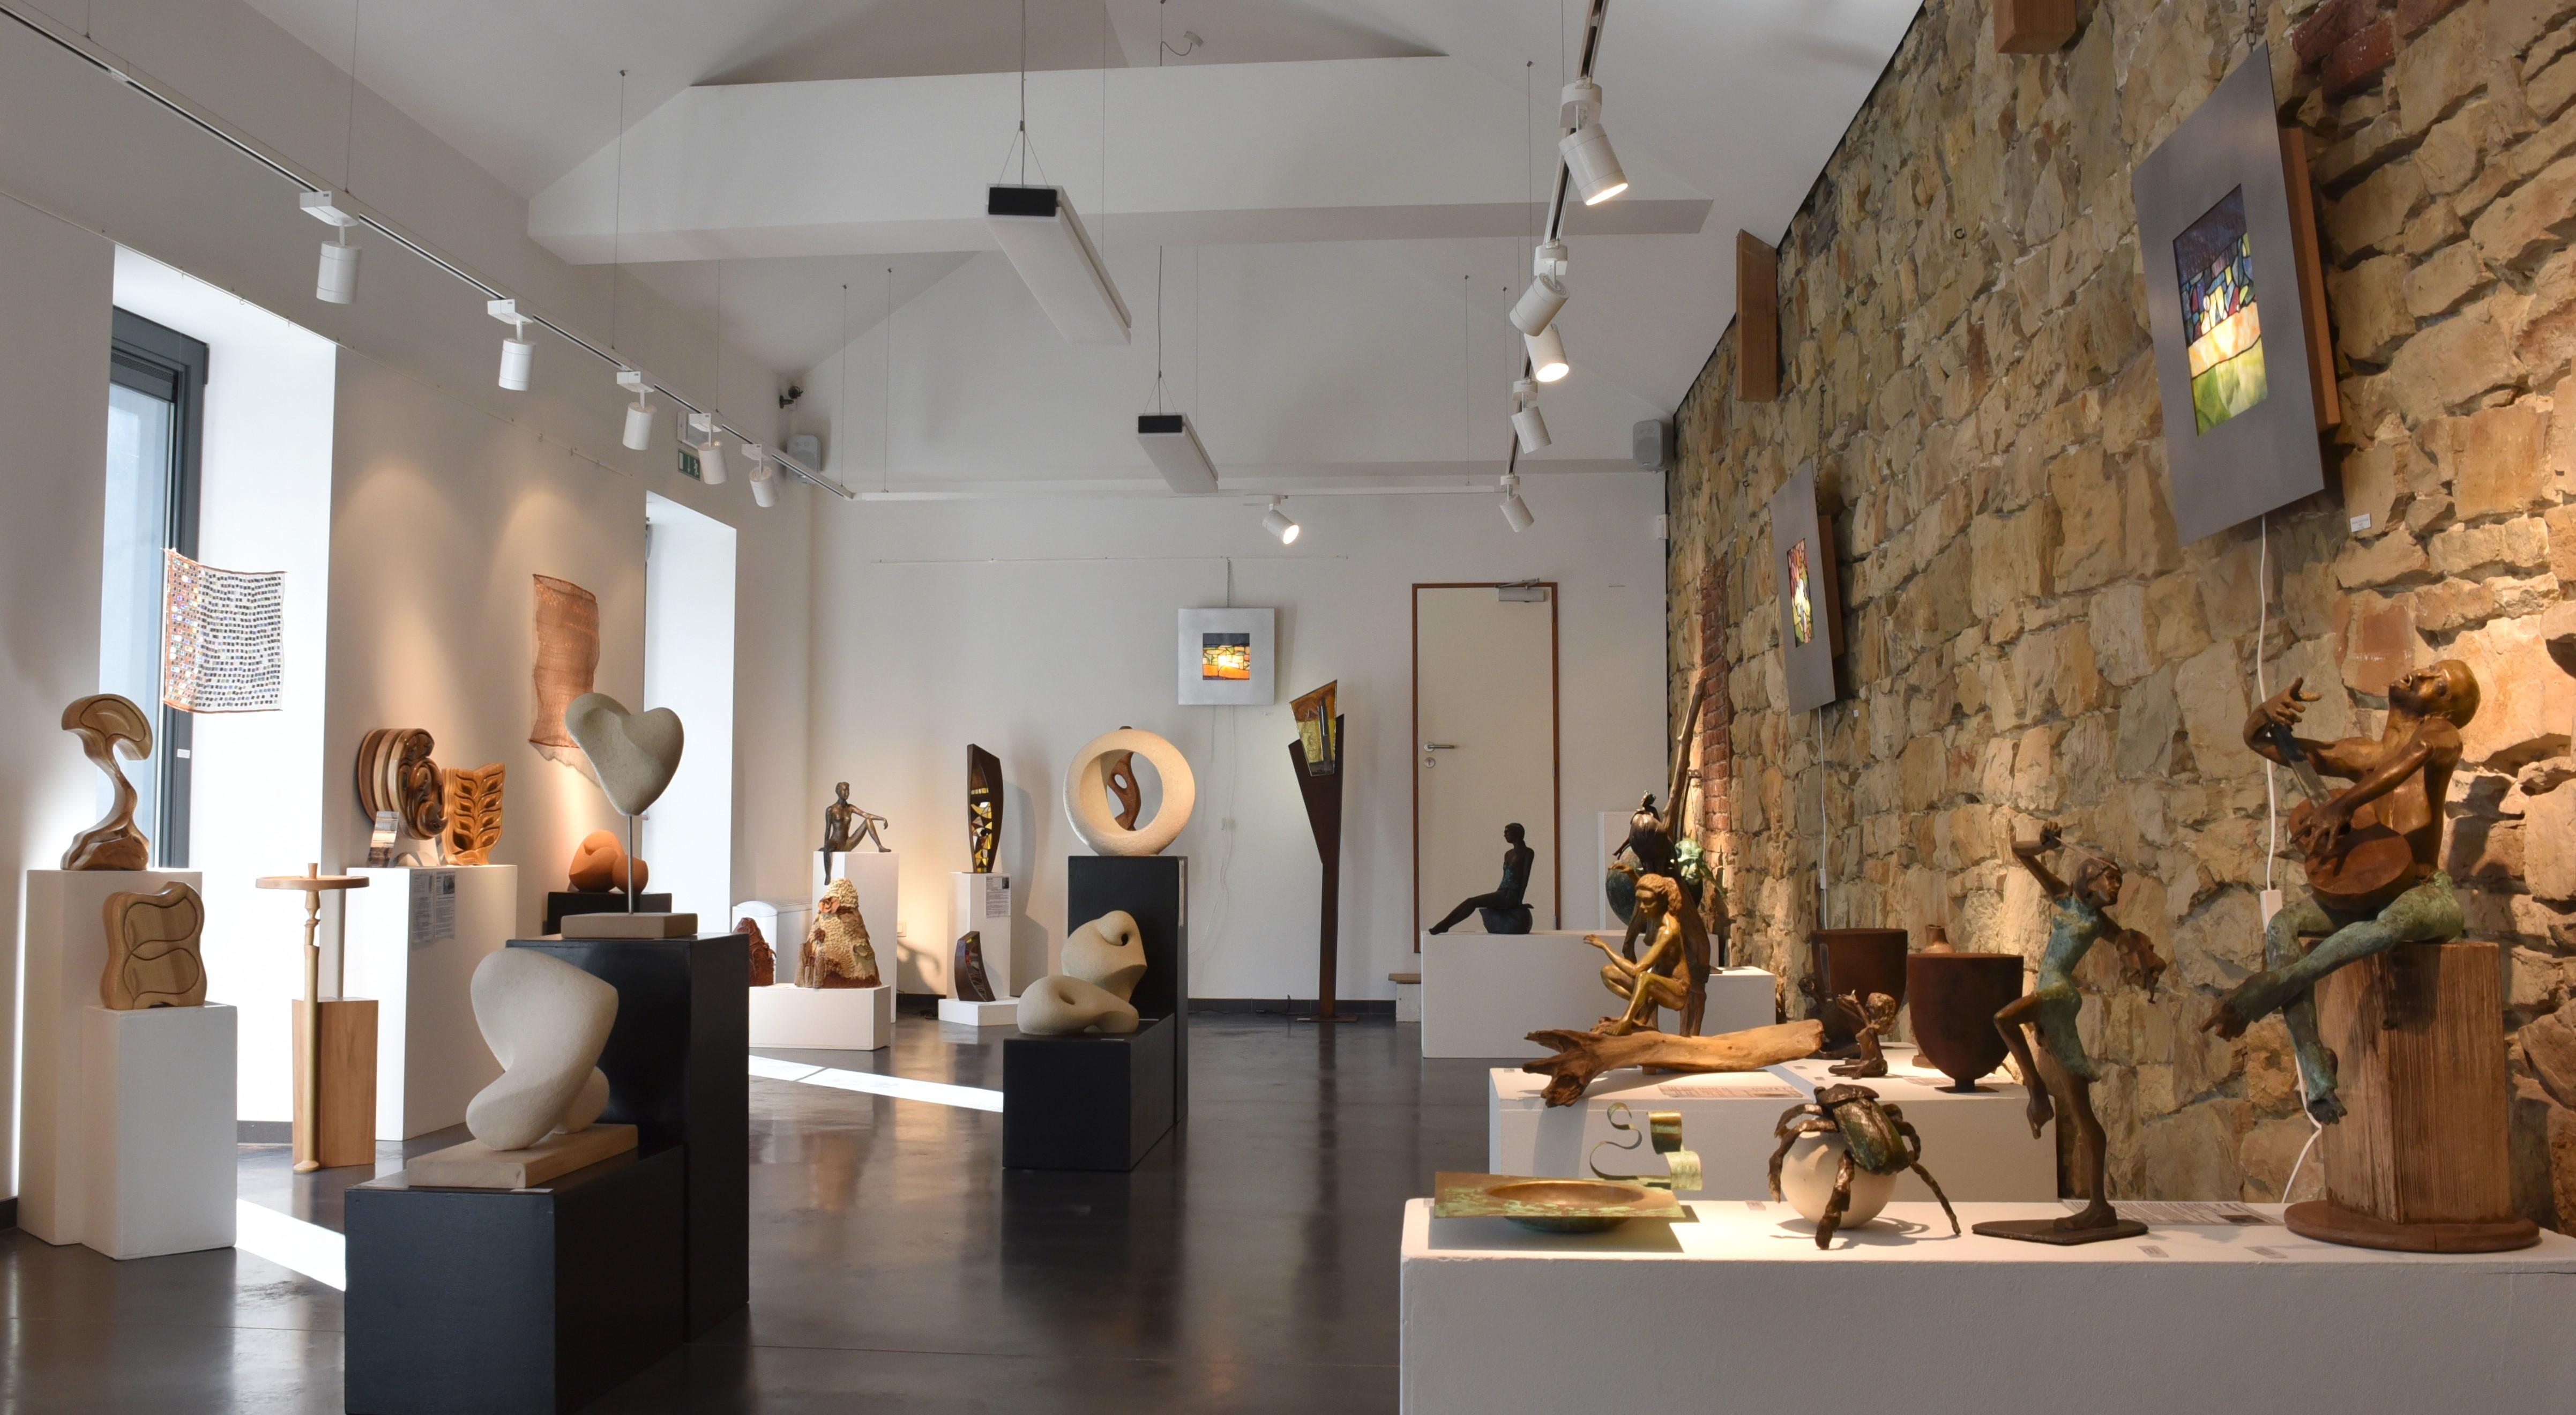 Exposition - Art & Culture - Natoye - Province de Namur